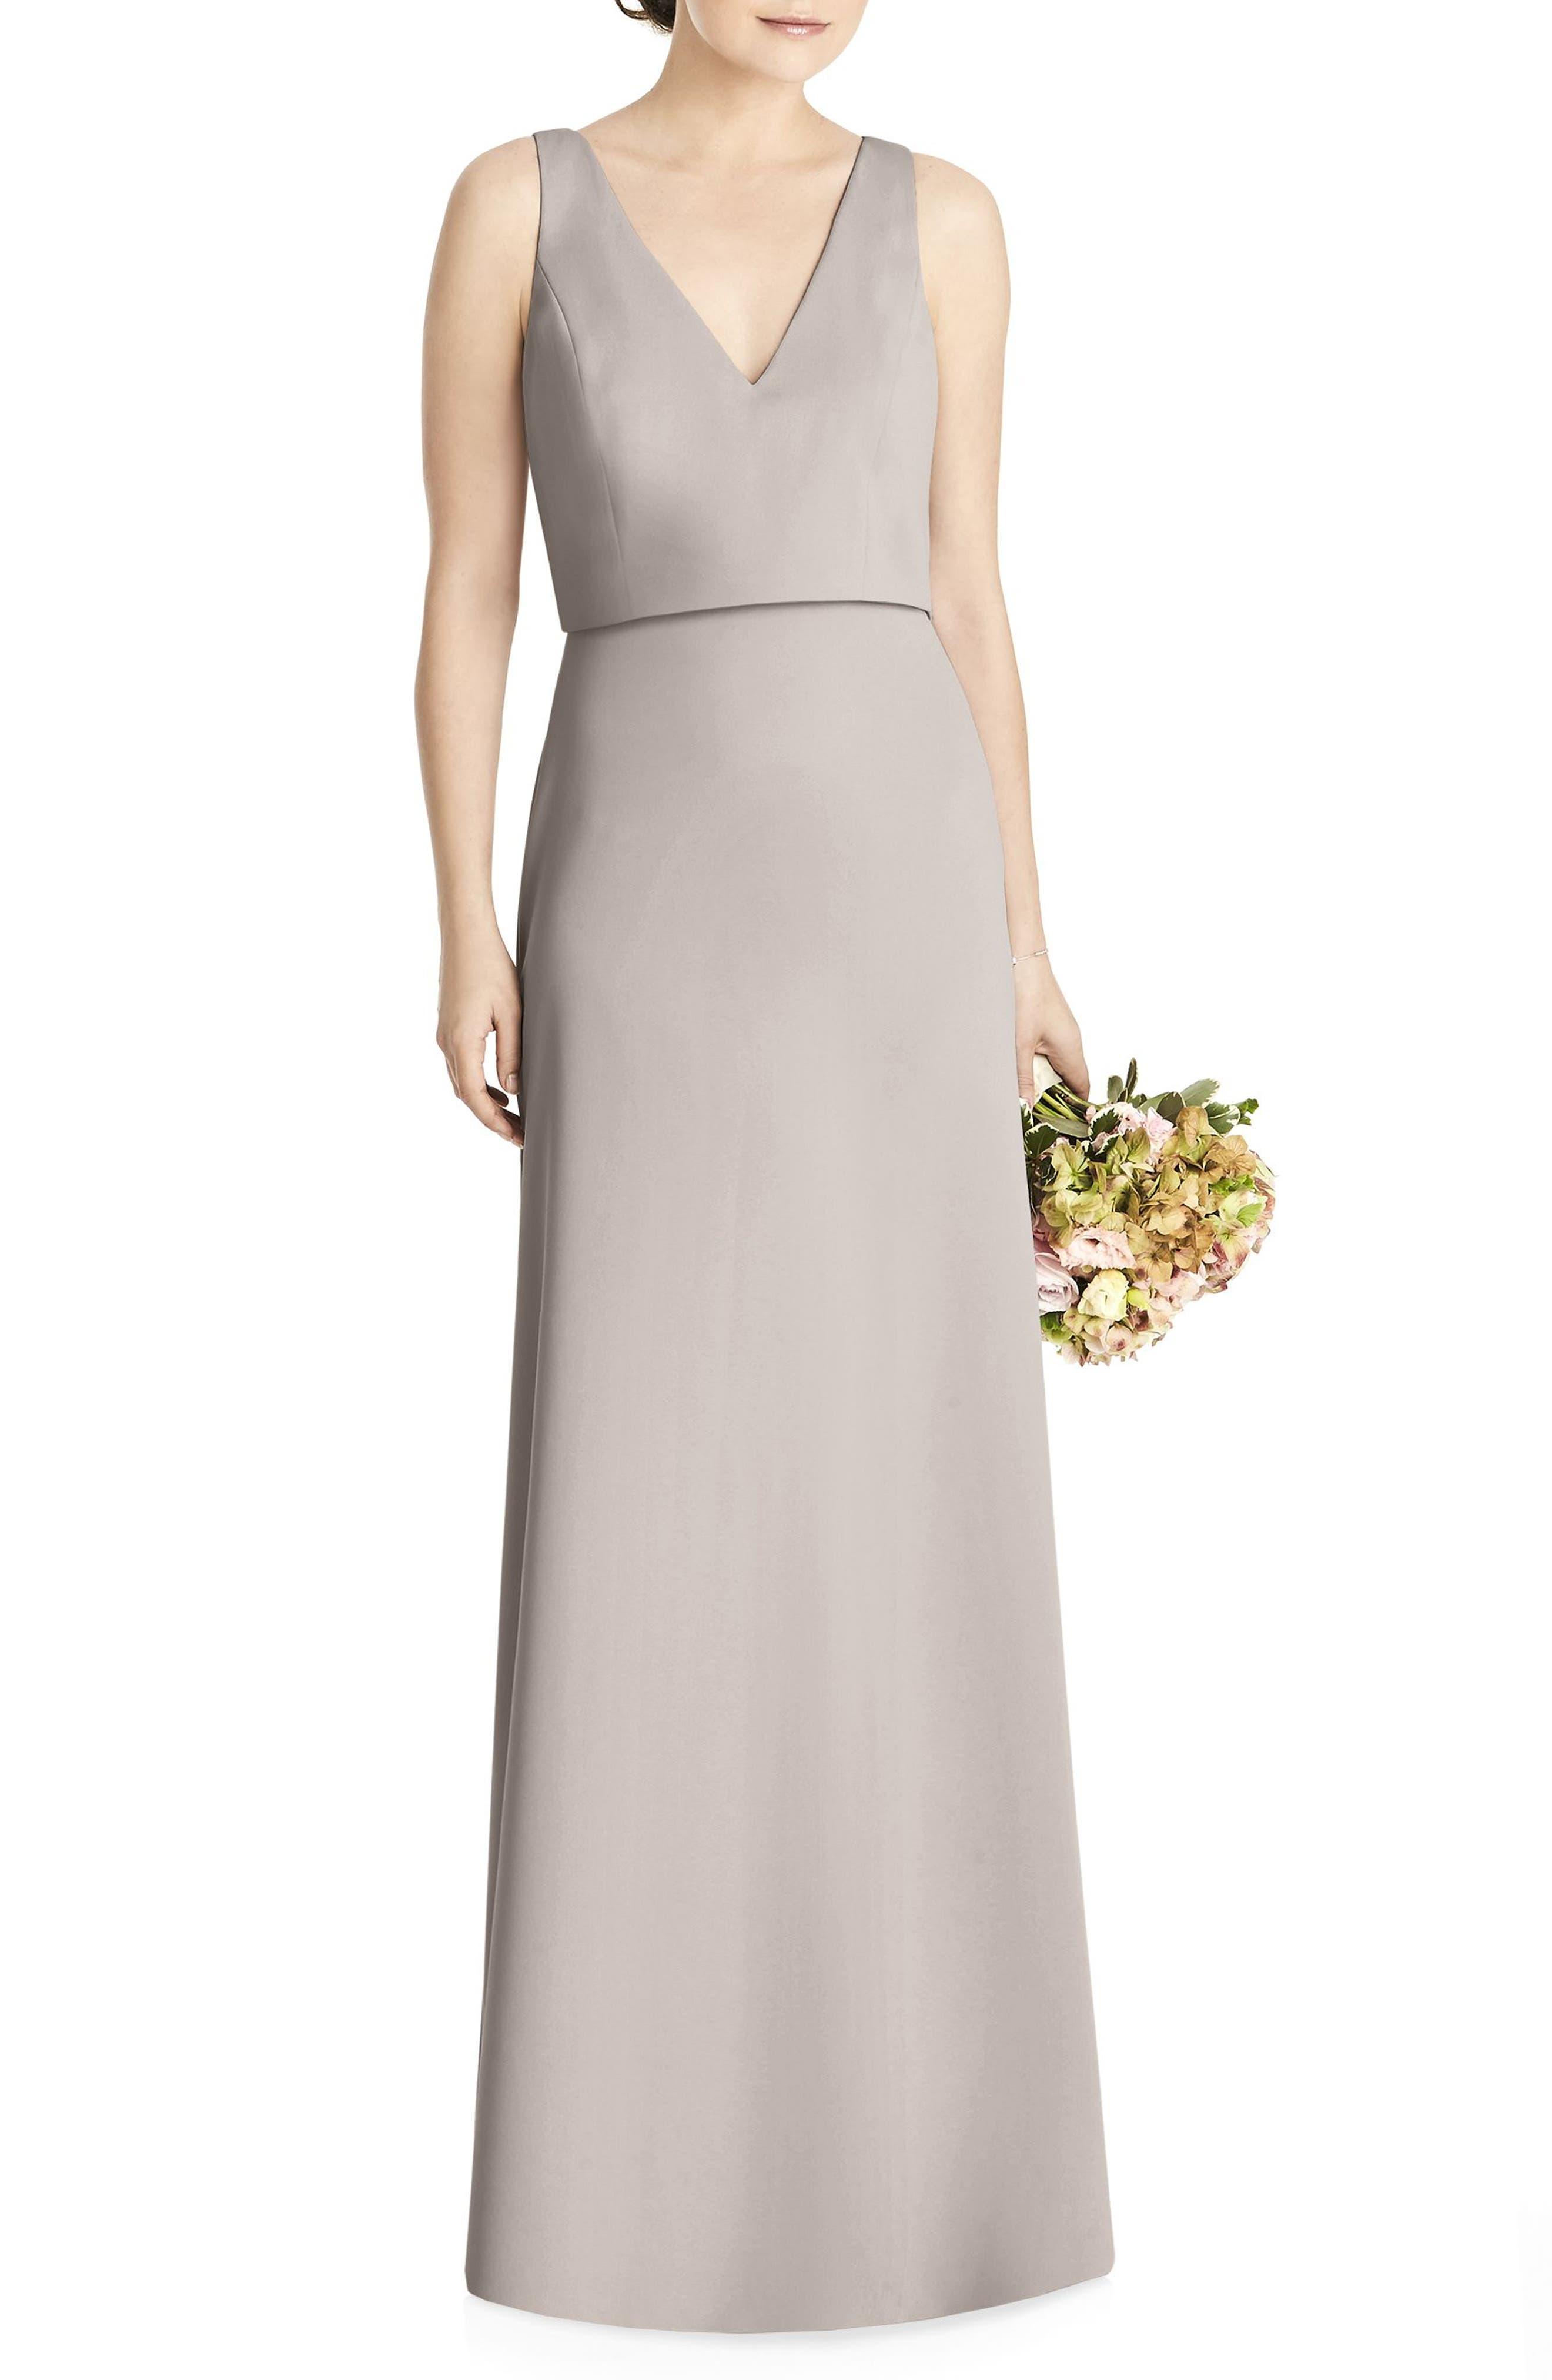 79c9f8ad124 JY Jenny Yoo Bridesmaid Dresses